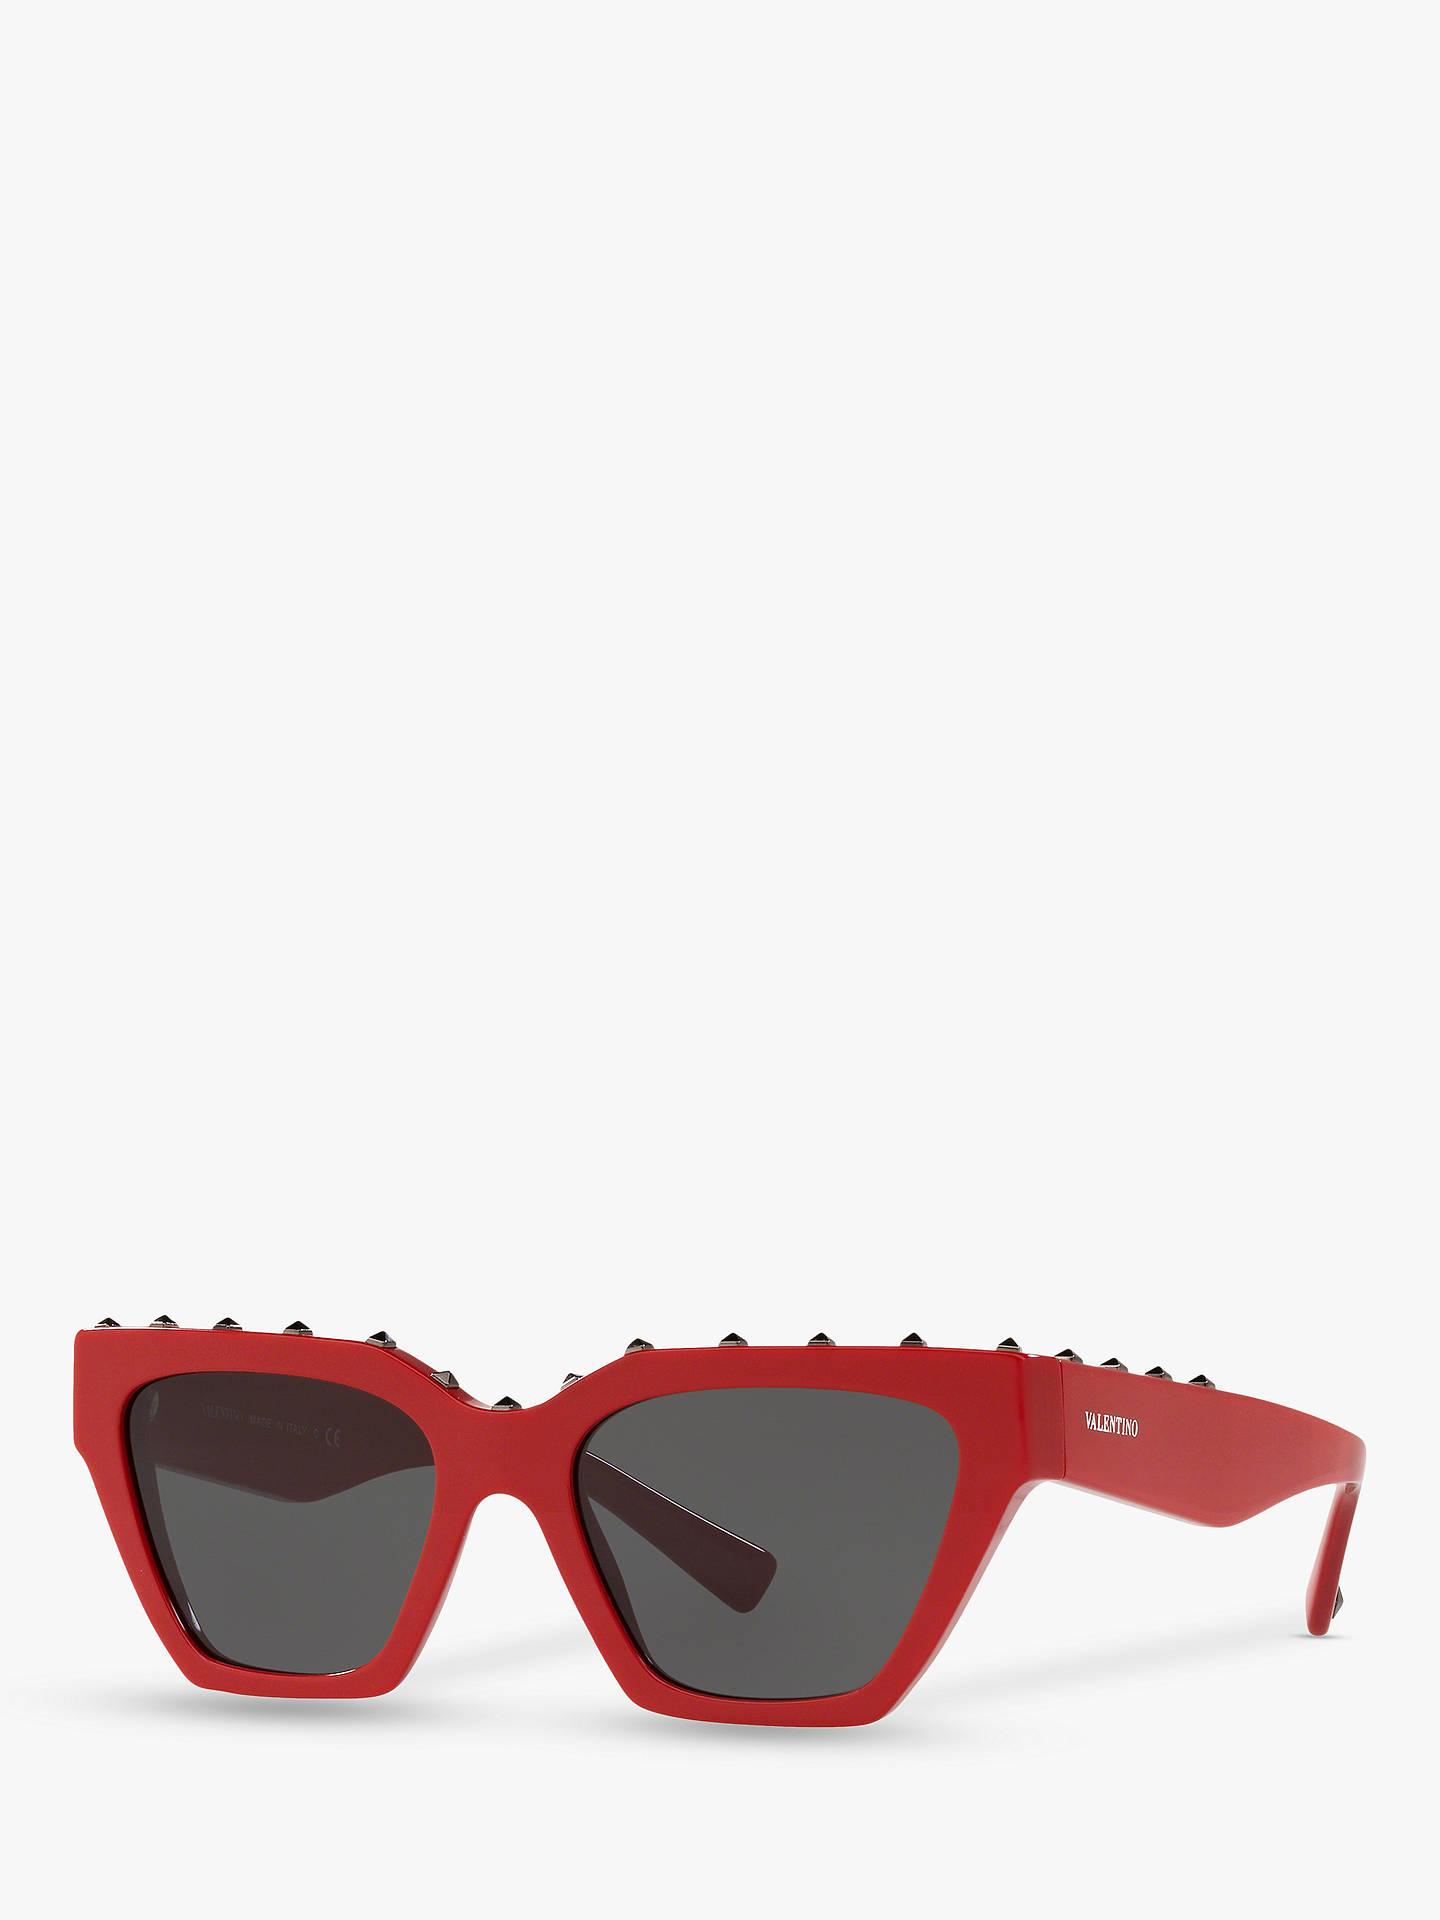 42ea78113760f Valentino VA4046 Women s Studded Square Sunglasses at John Lewis ...